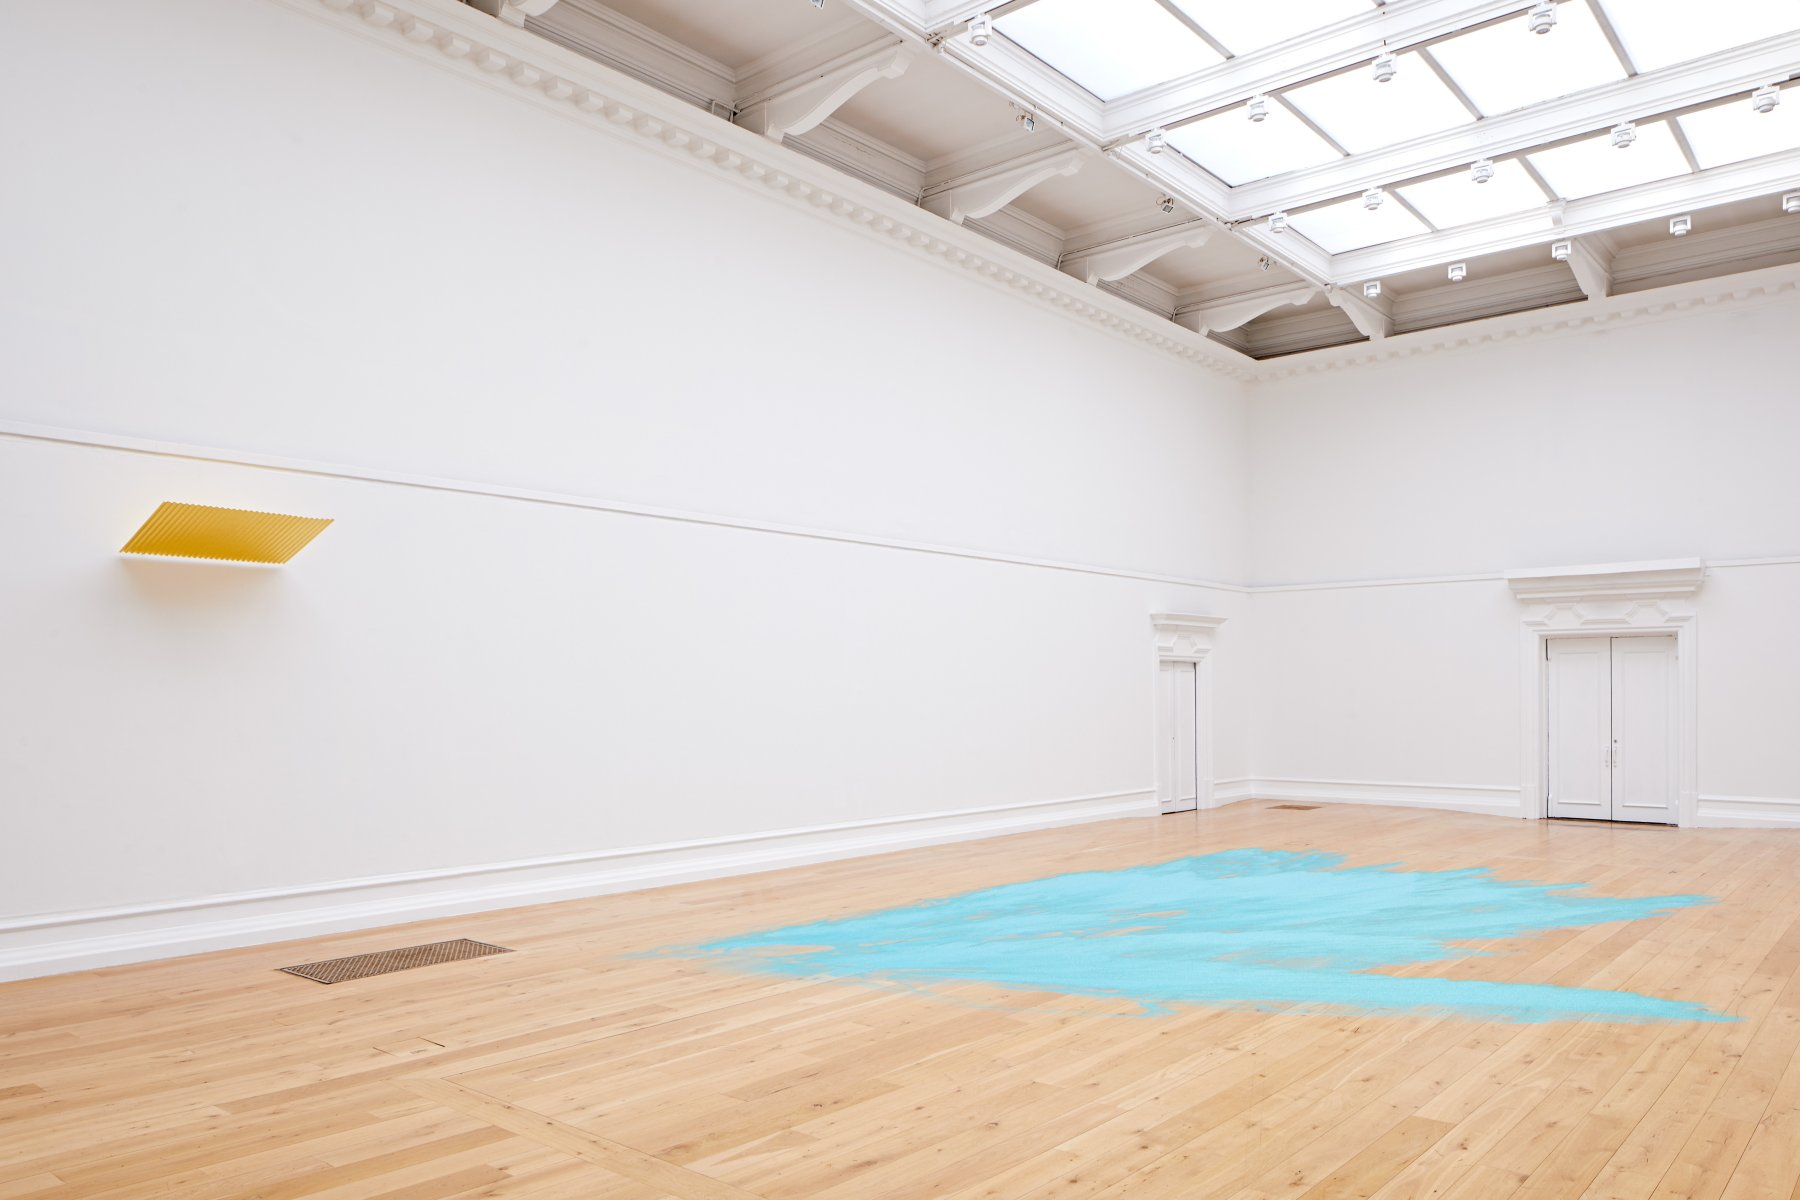 South London Gallery Ann Veronica Janssens 1